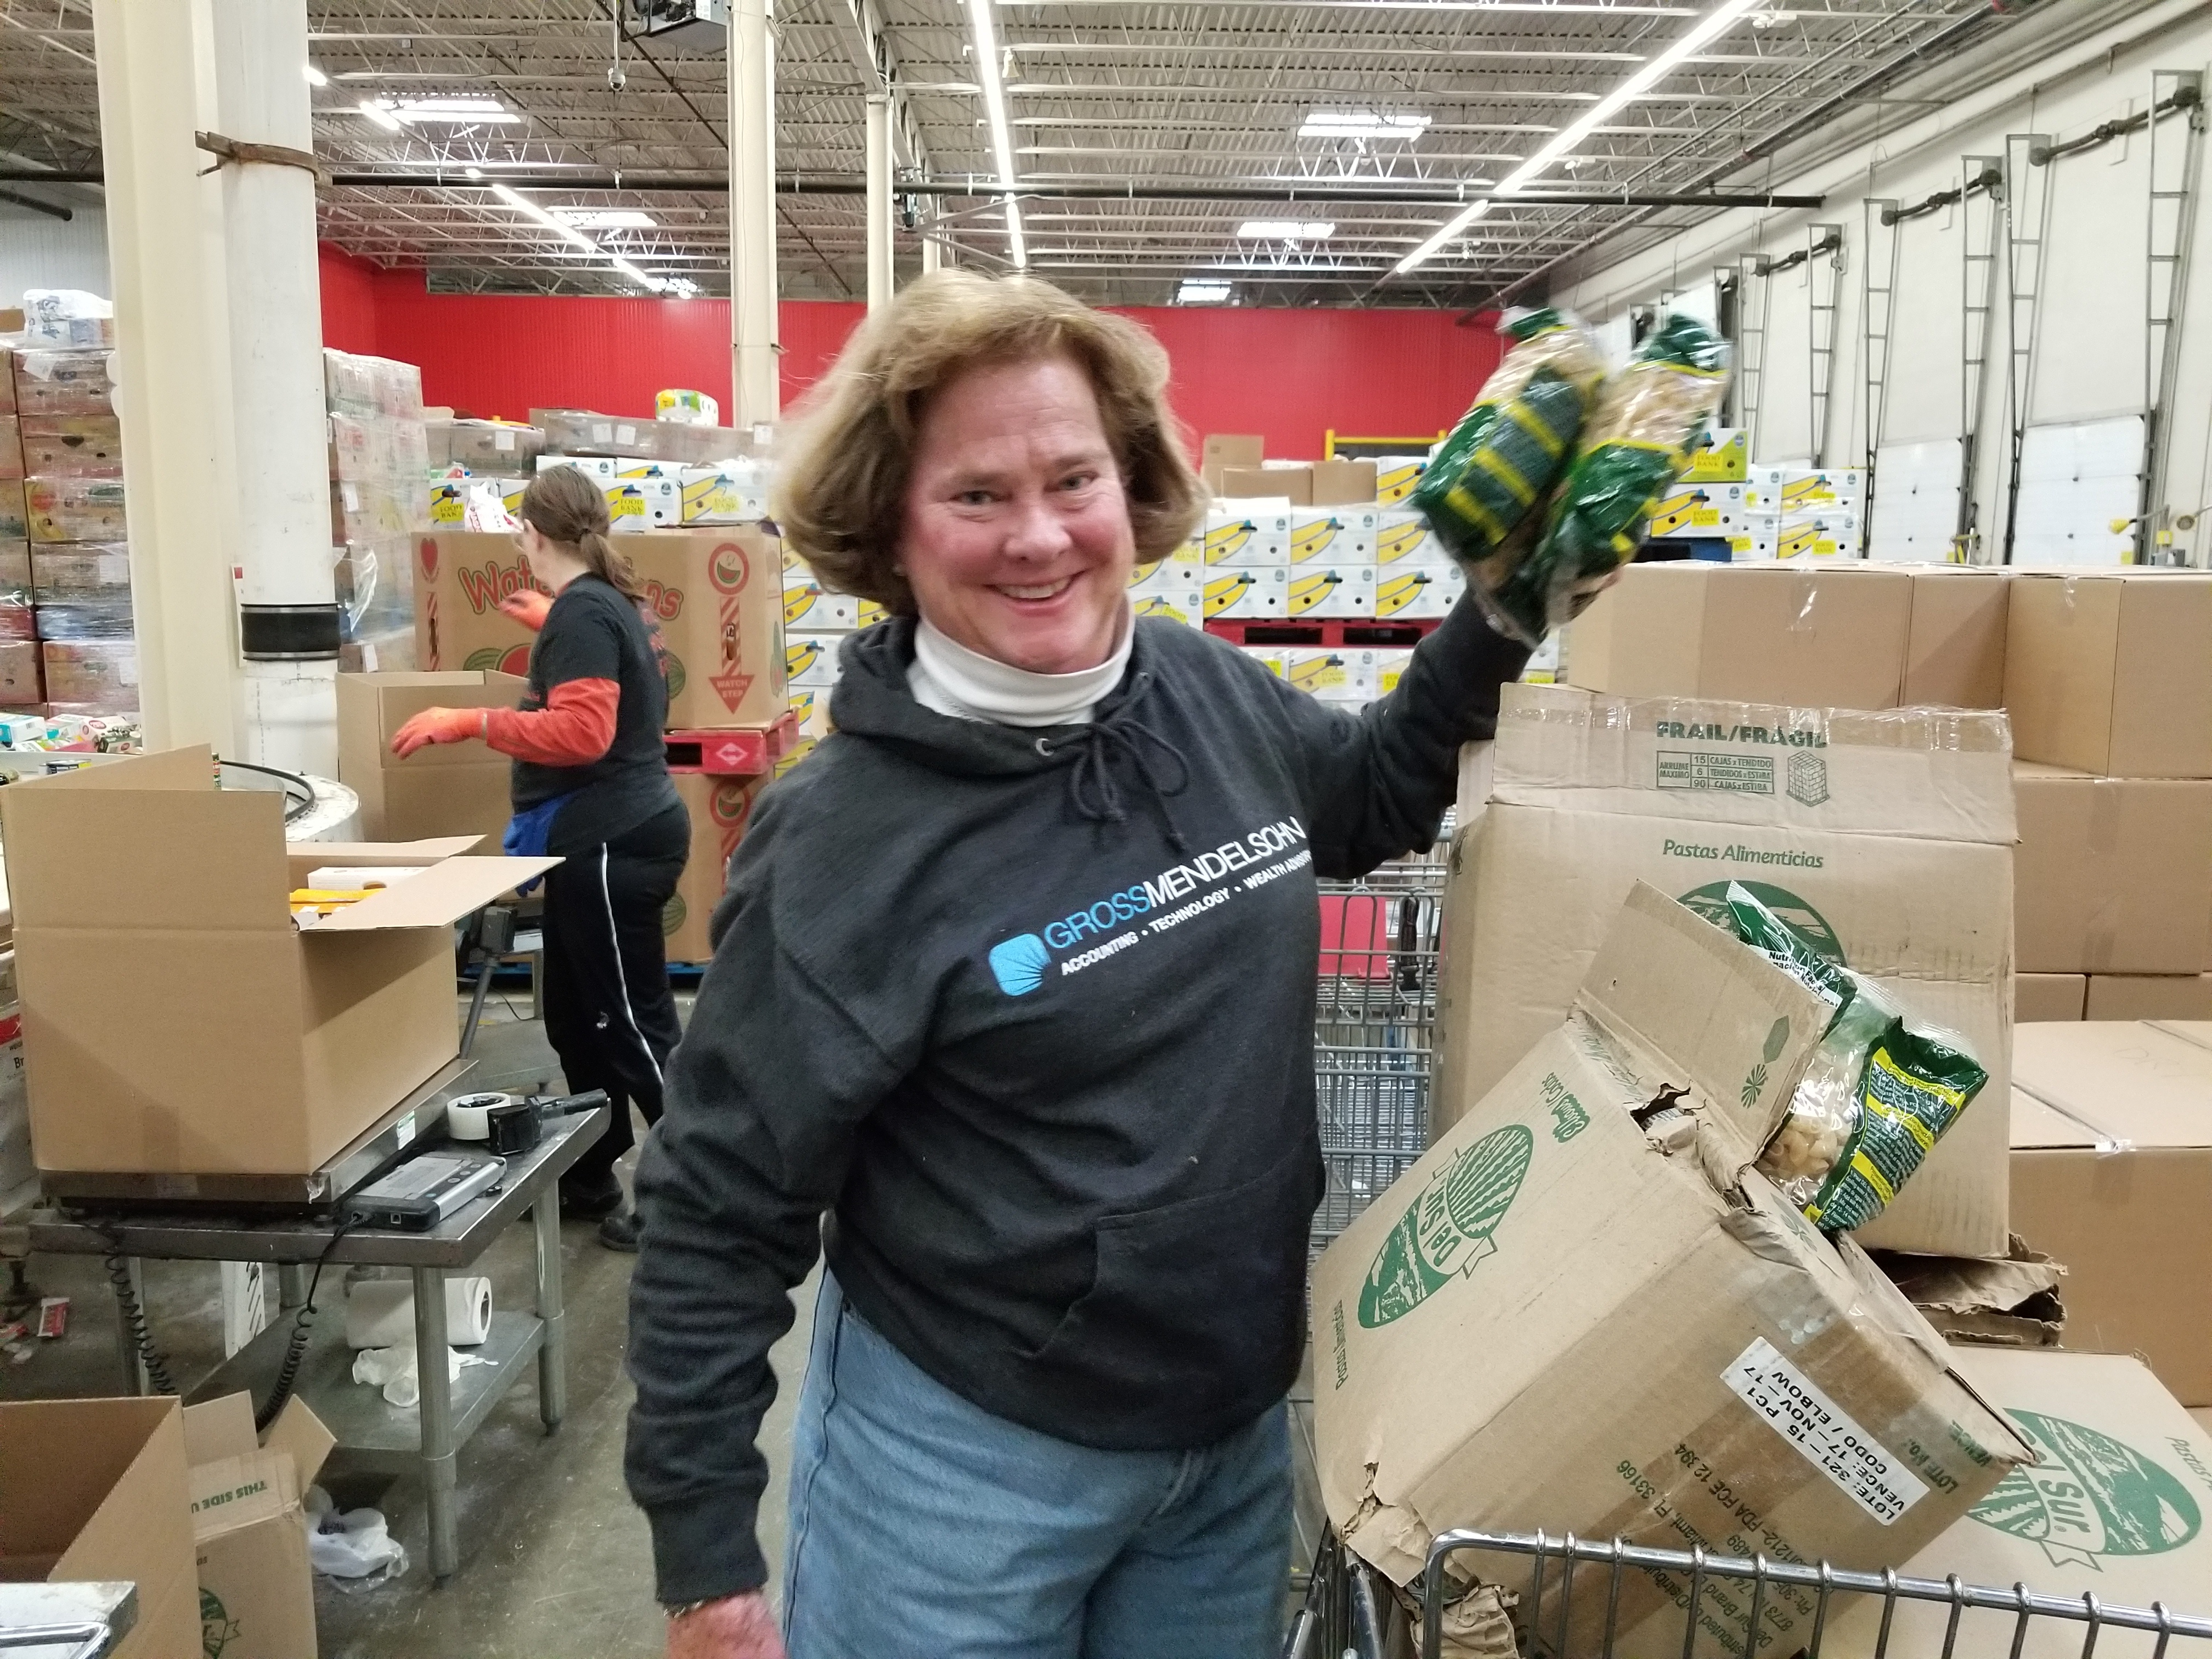 Tricia Thomas volunteers at Maryland Food Bank